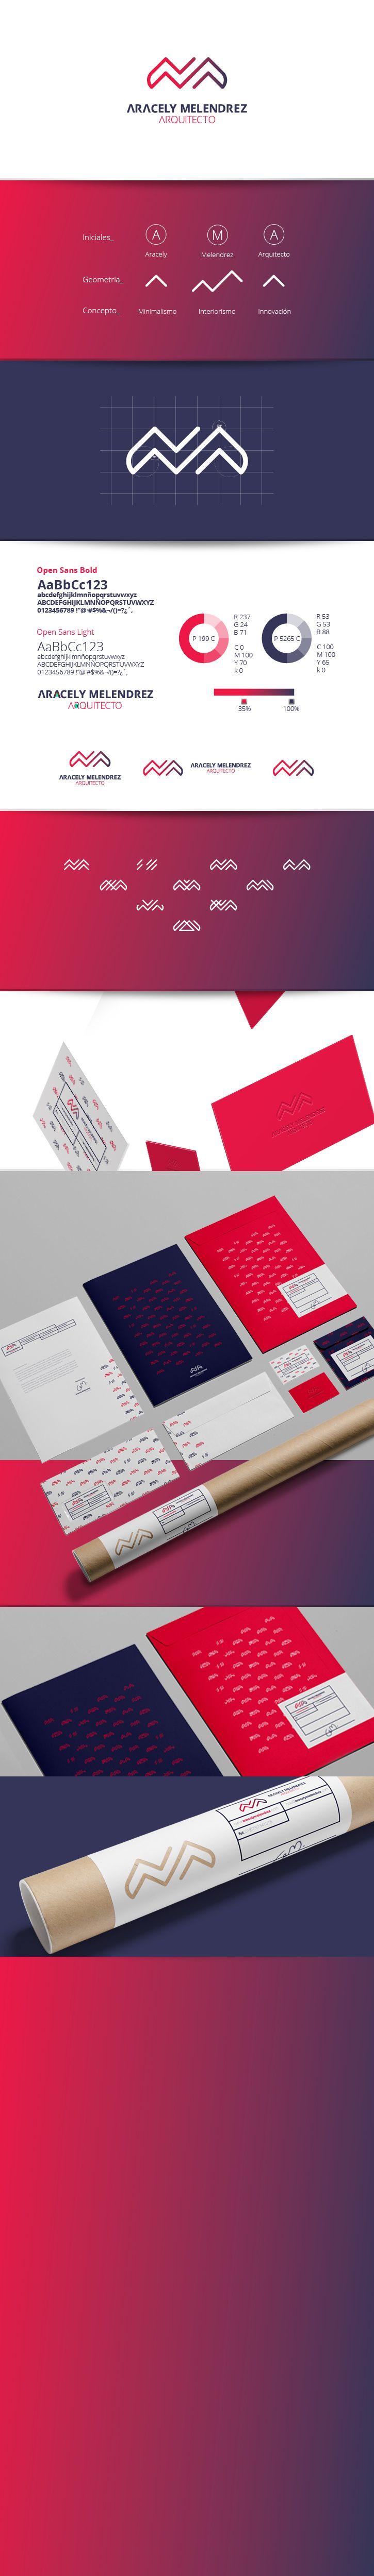 Aracely Melendrez Arquitecto - Identity Branding, Graphic Design, Pattern Design